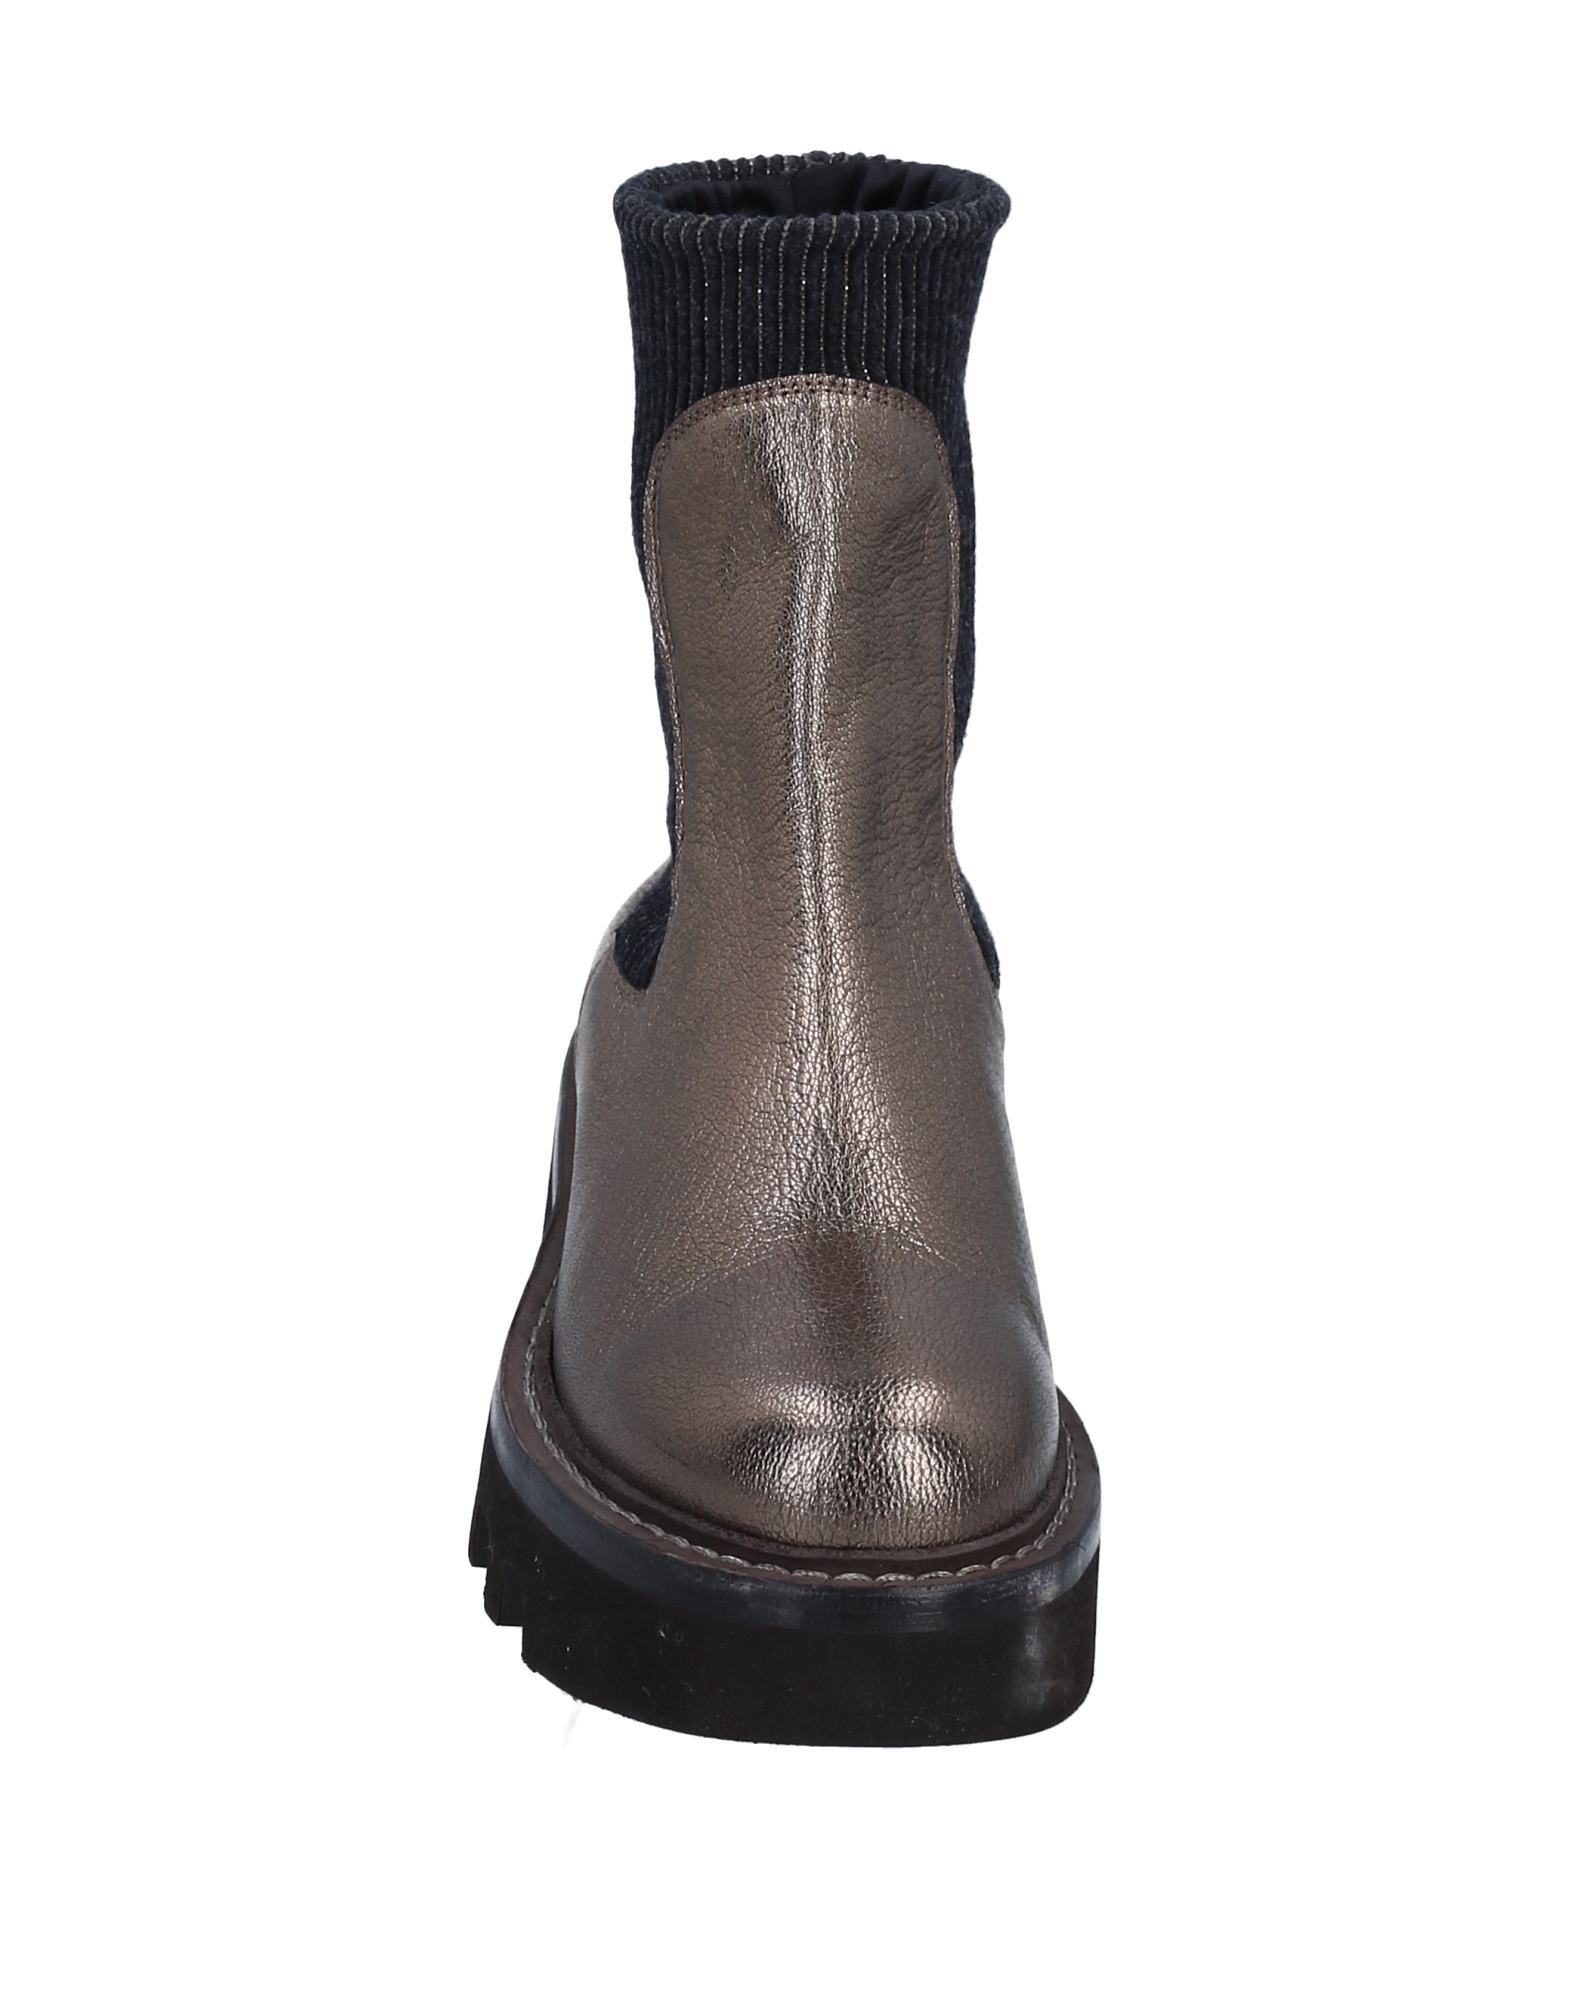 Brunello Cucinelli Ankle Boot - Women Brunello Cucinelli Ankle Boots Boots Boots online on  United Kingdom - 11516302UT 76ec87